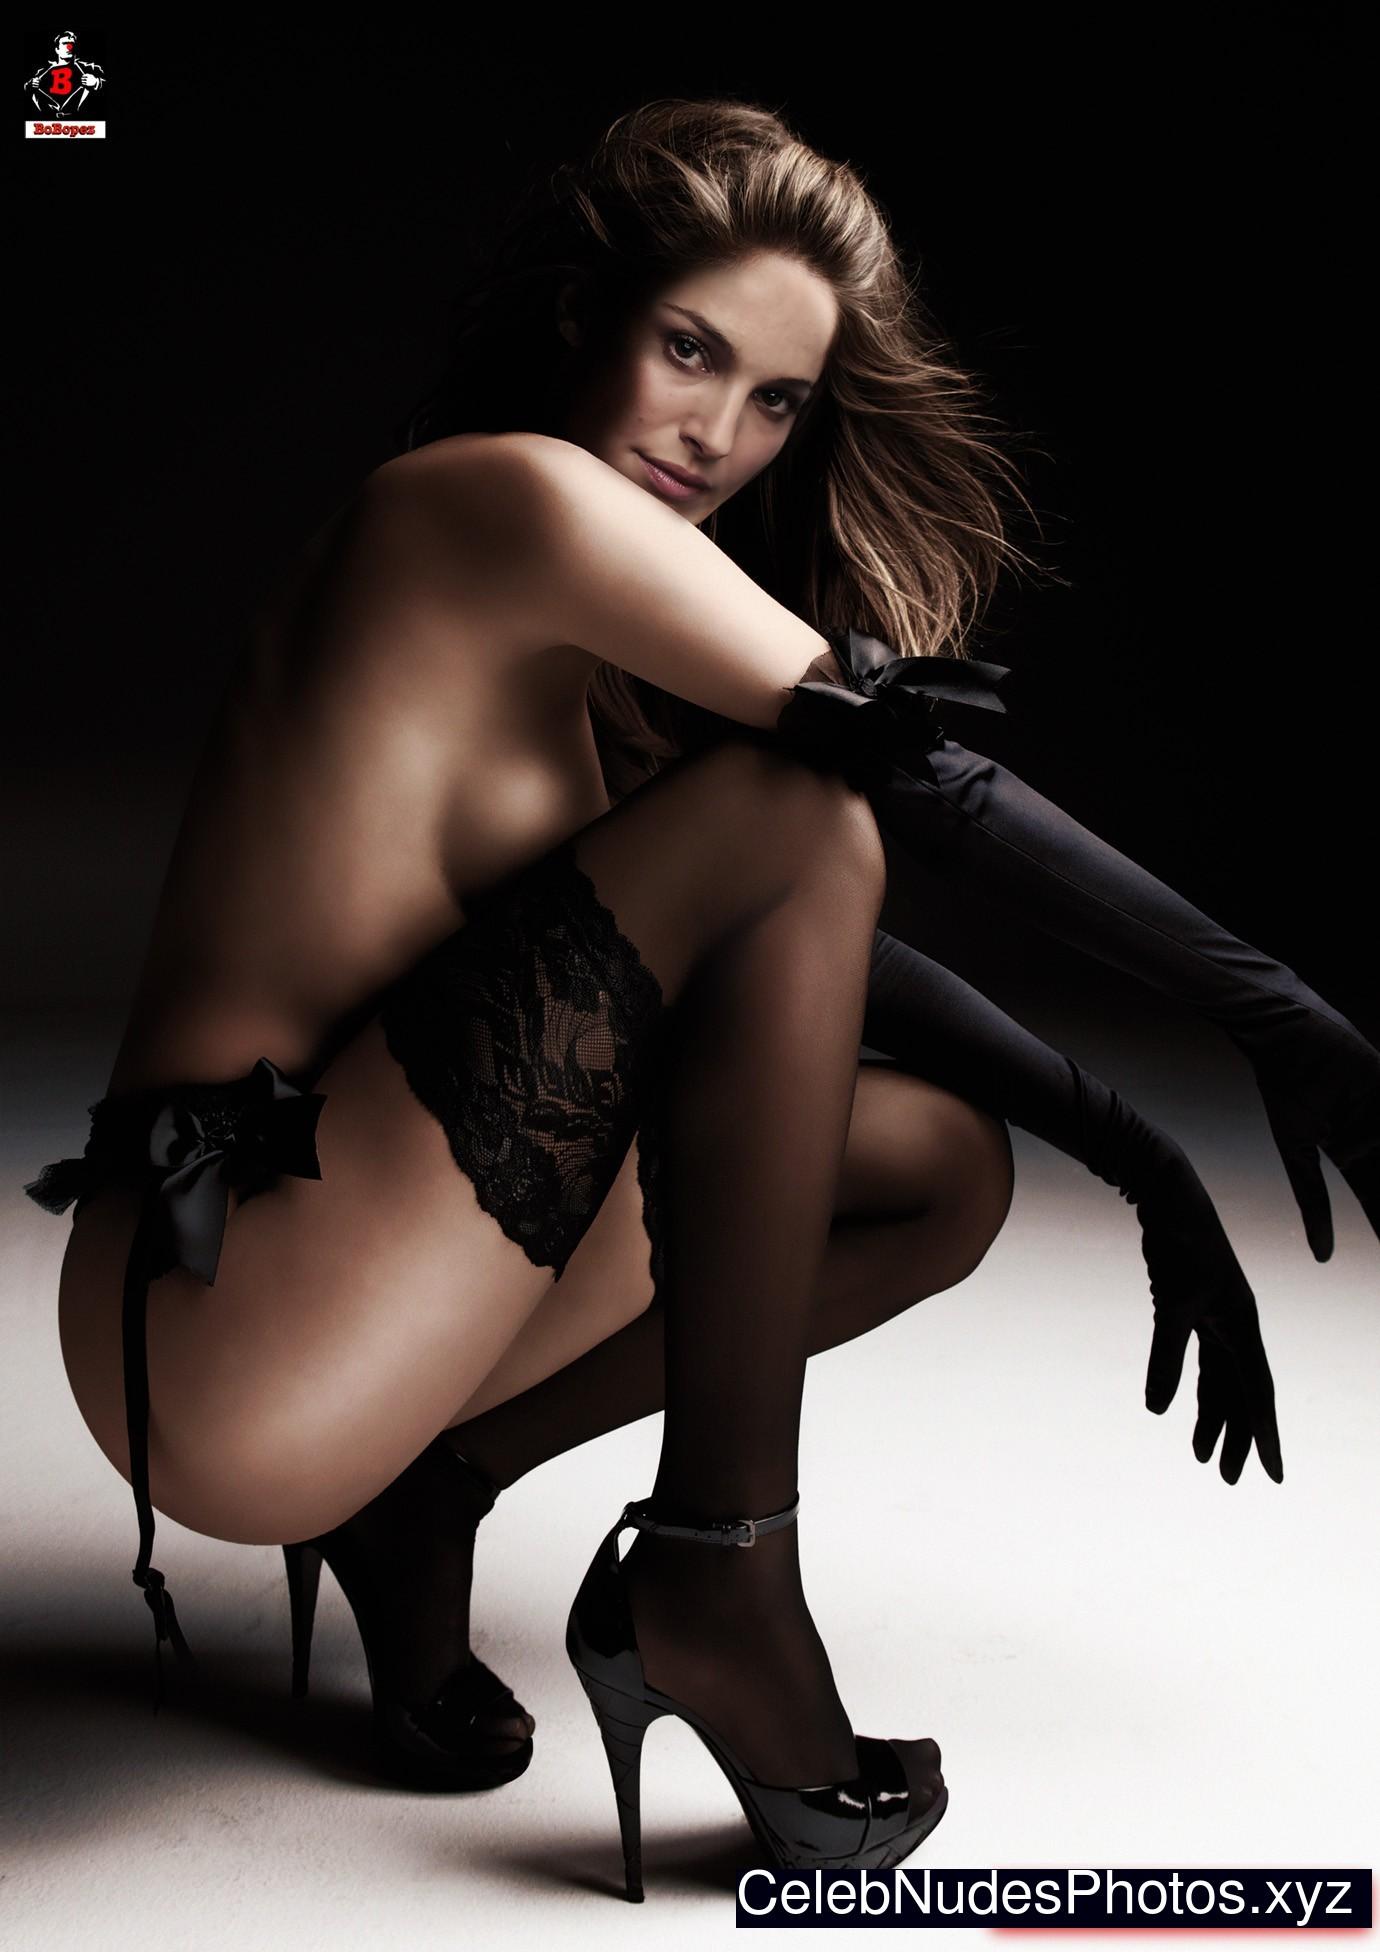 chica amateur nude pics